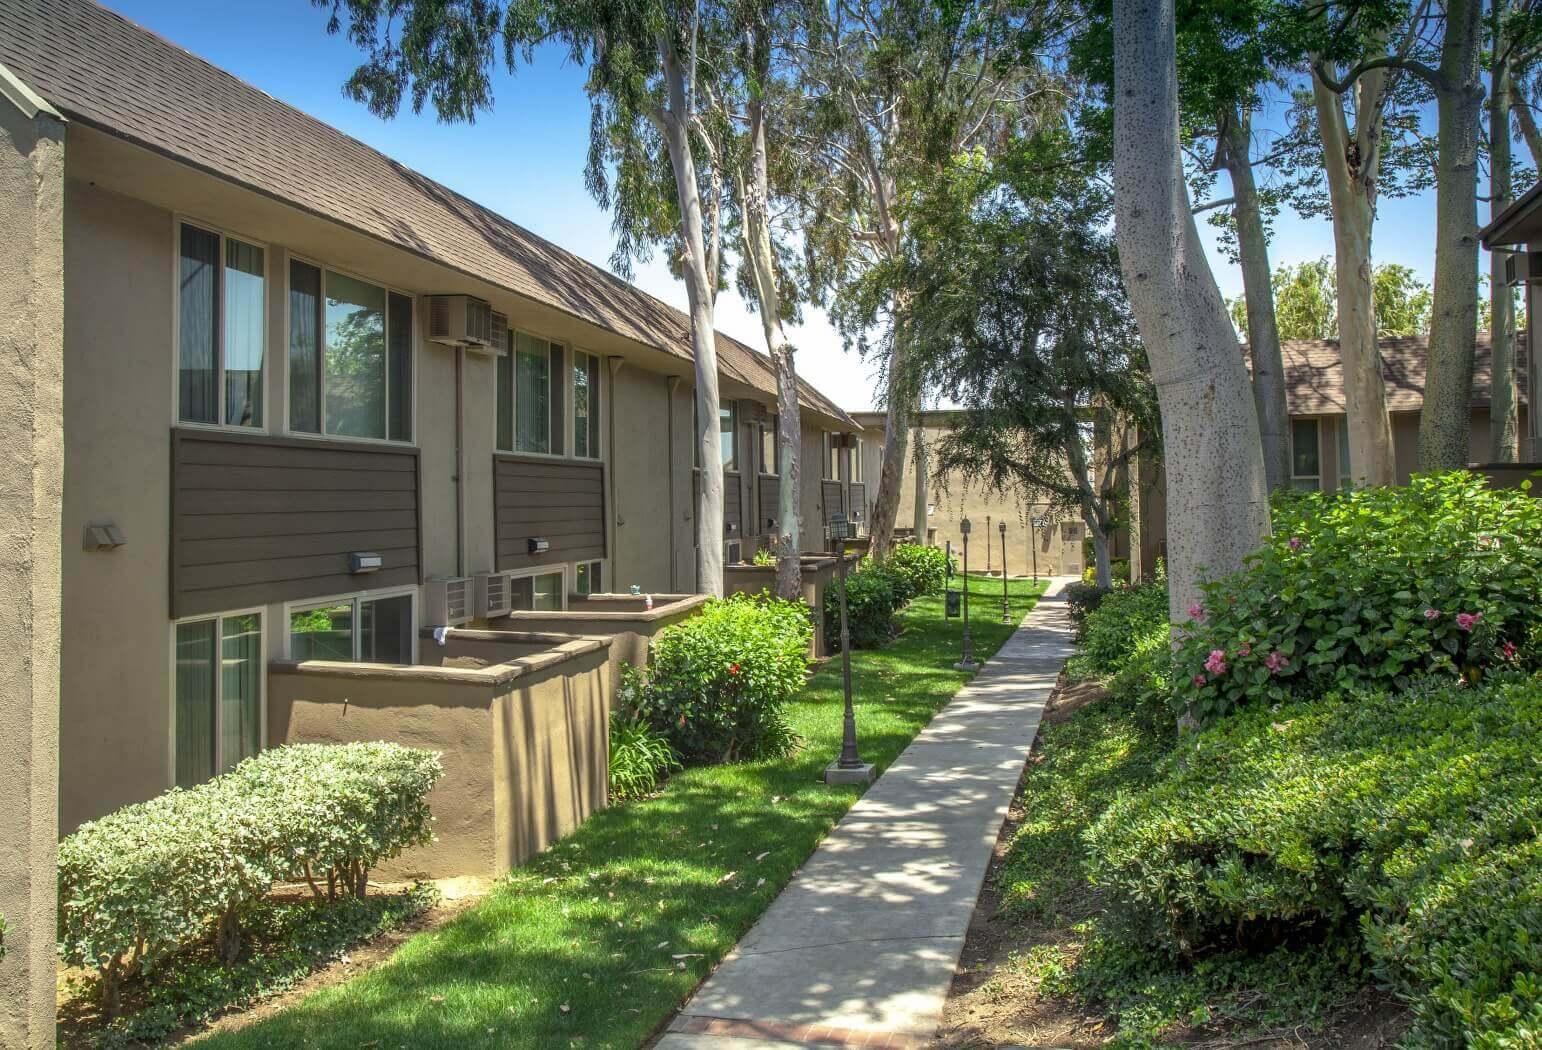 Secured Beautiful Gardens at Hills at Hacienda Heights, Hacienda Heights, CA